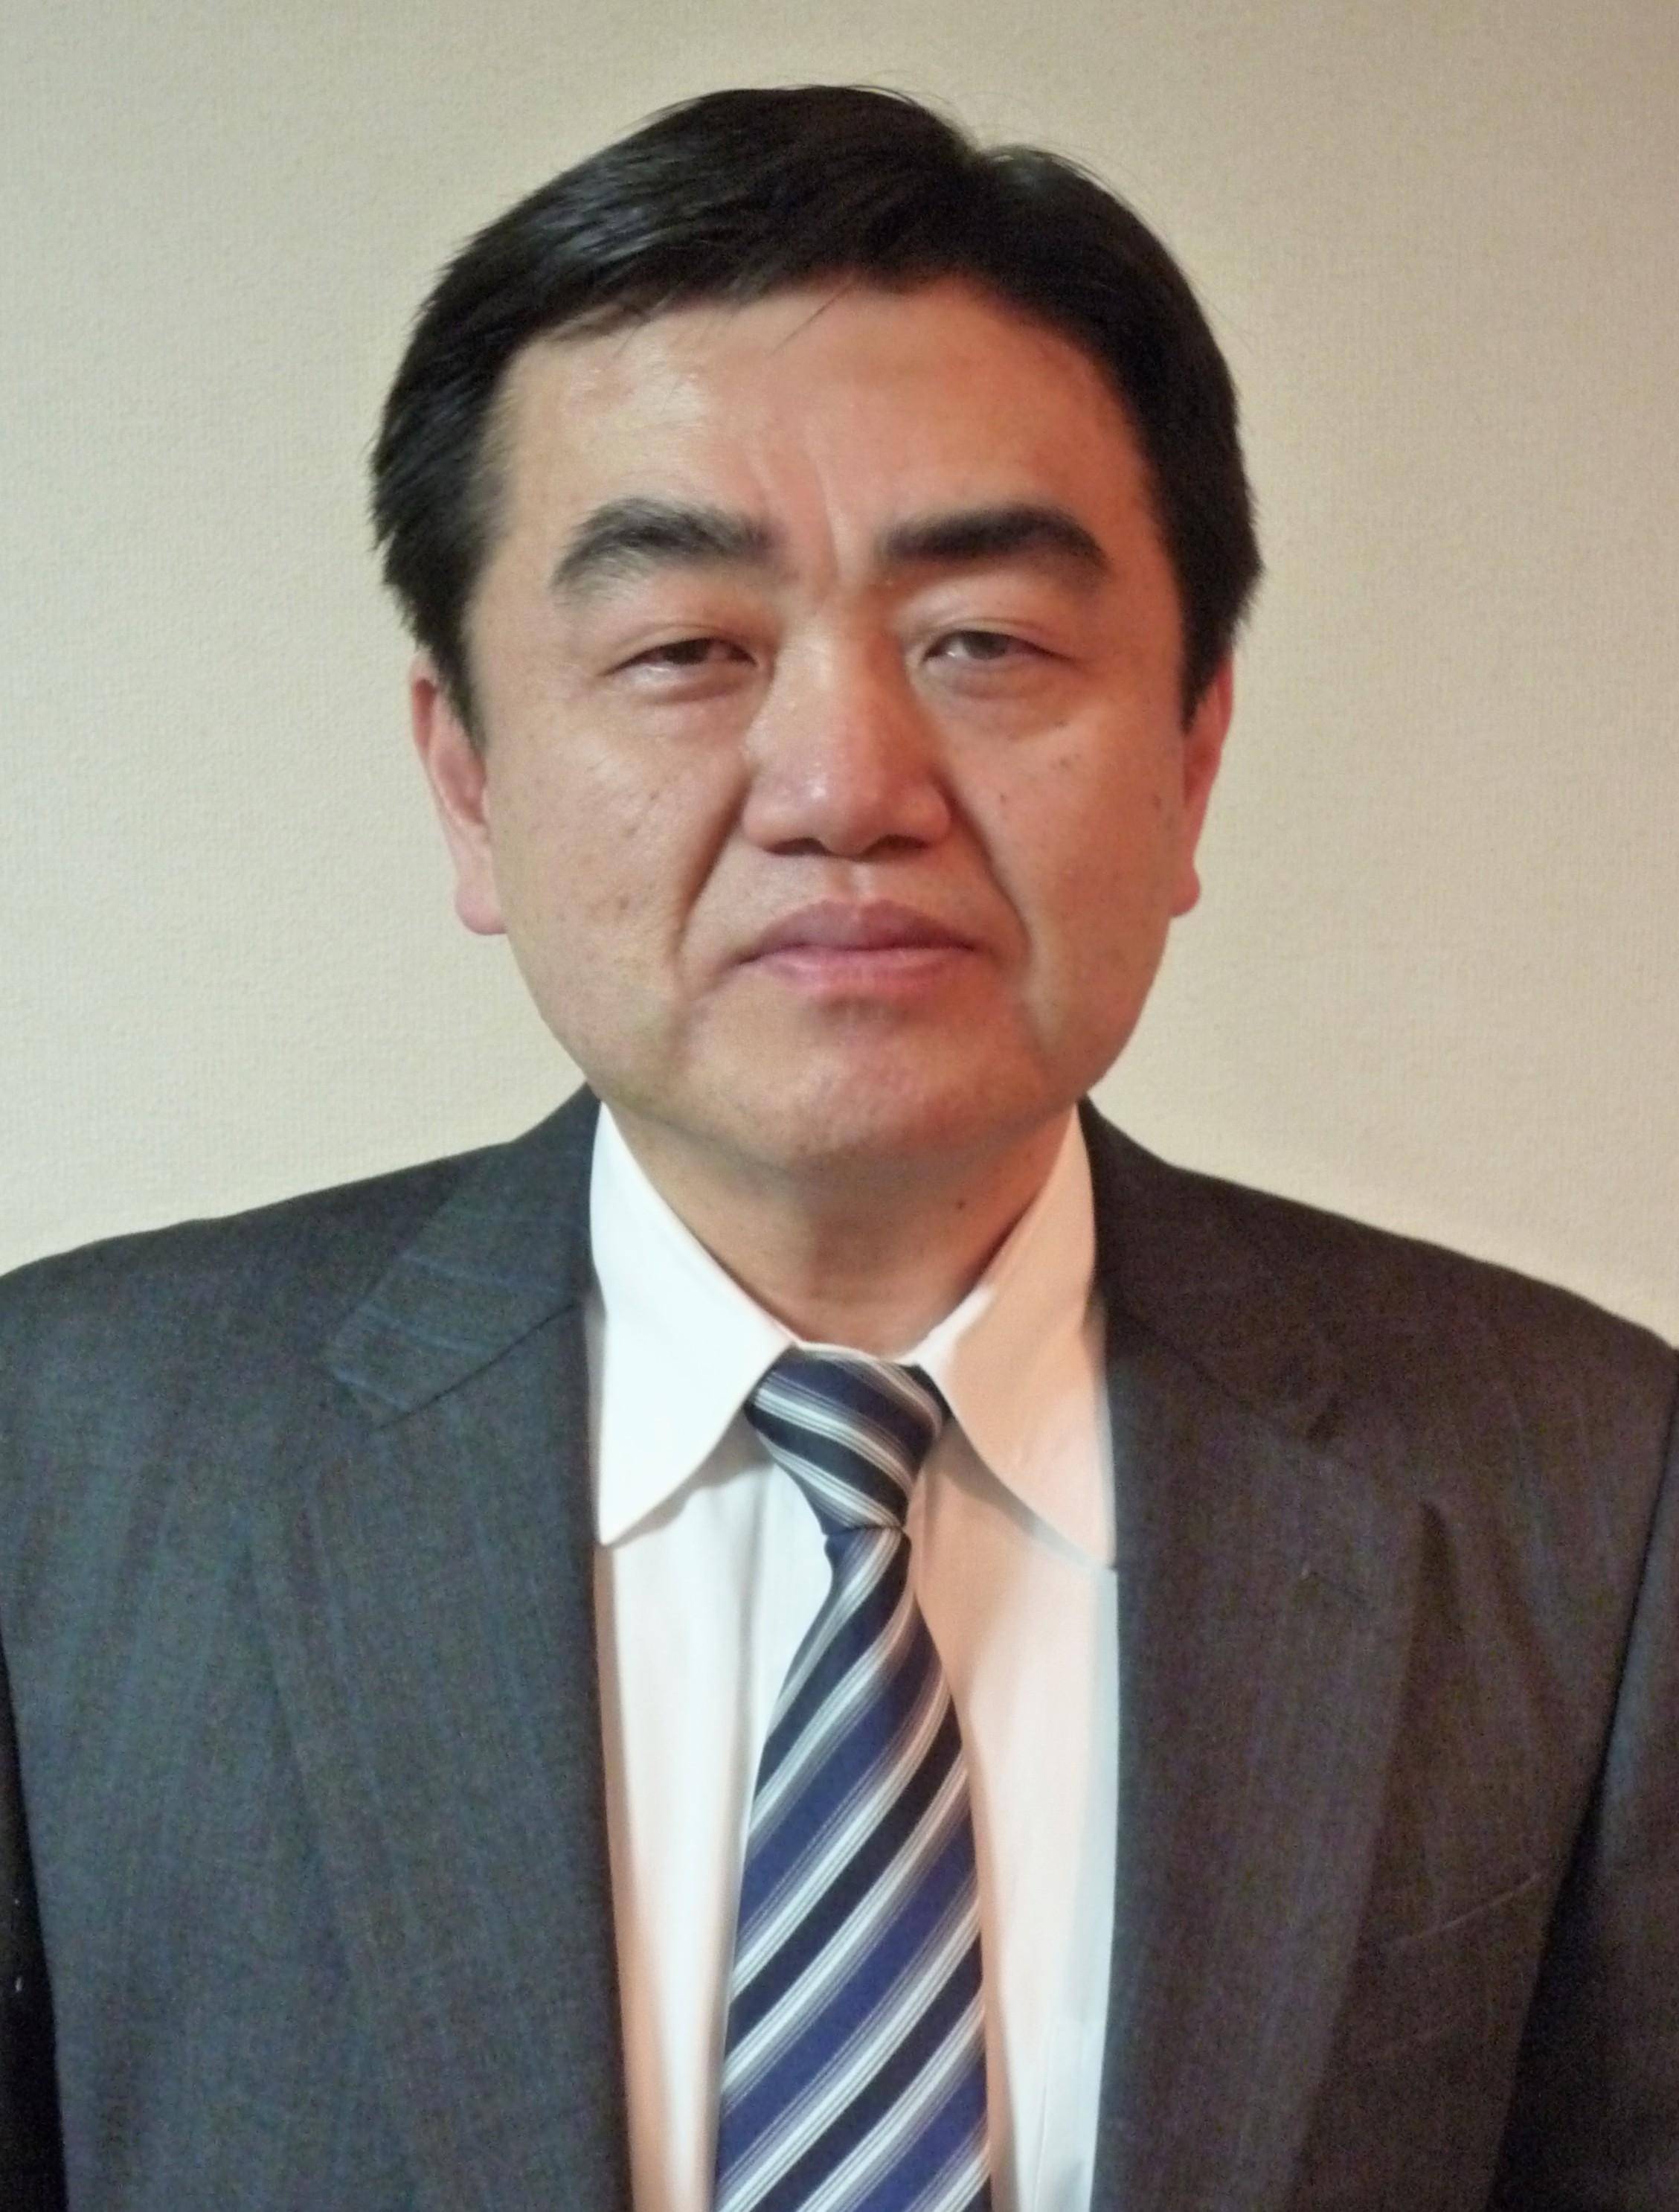 Mr. Masanori Oki